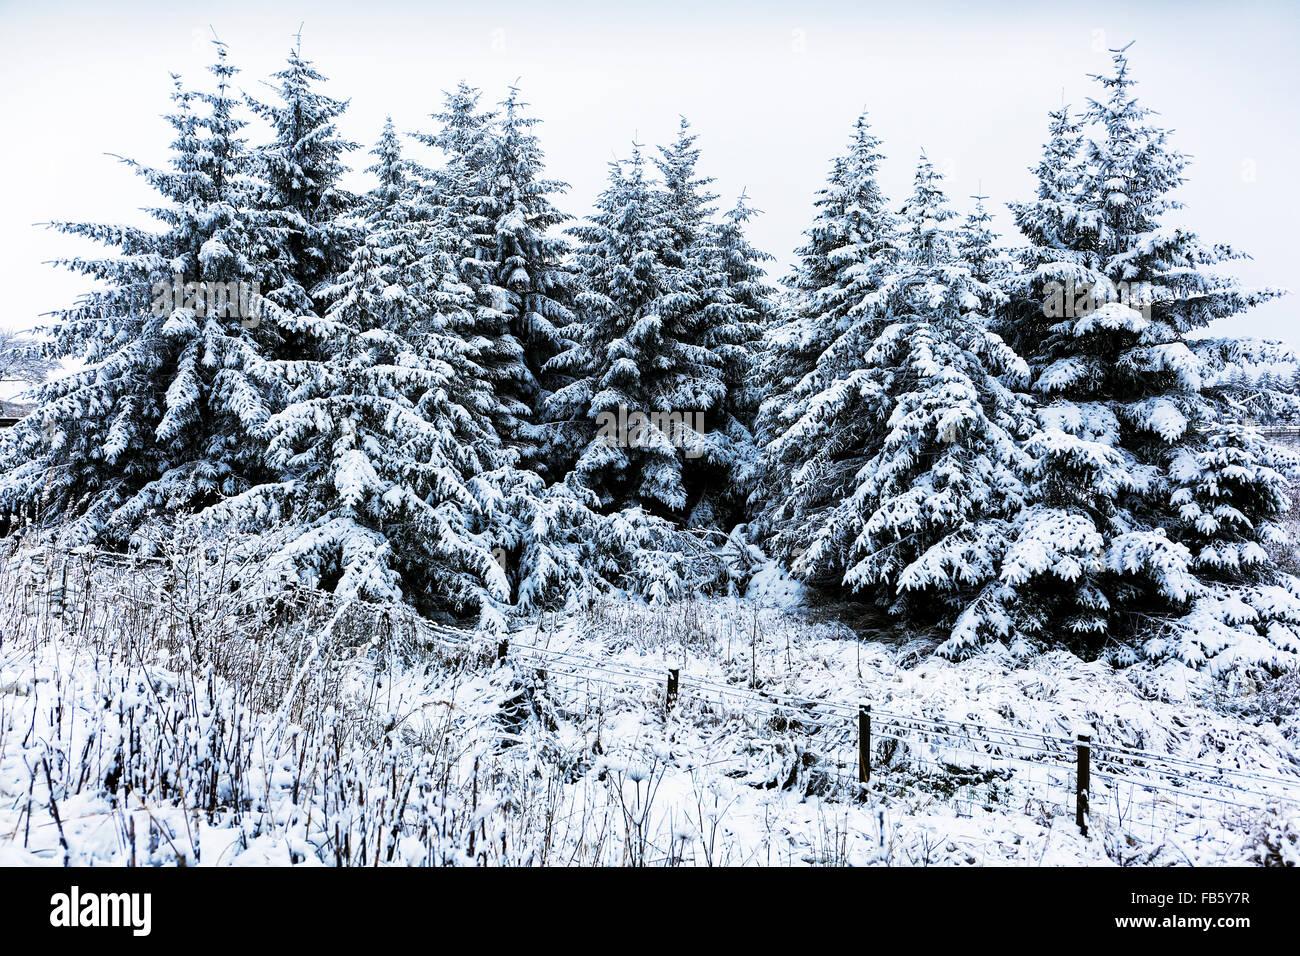 Fir trees with snow, winter, Scotland, UK - Stock Image